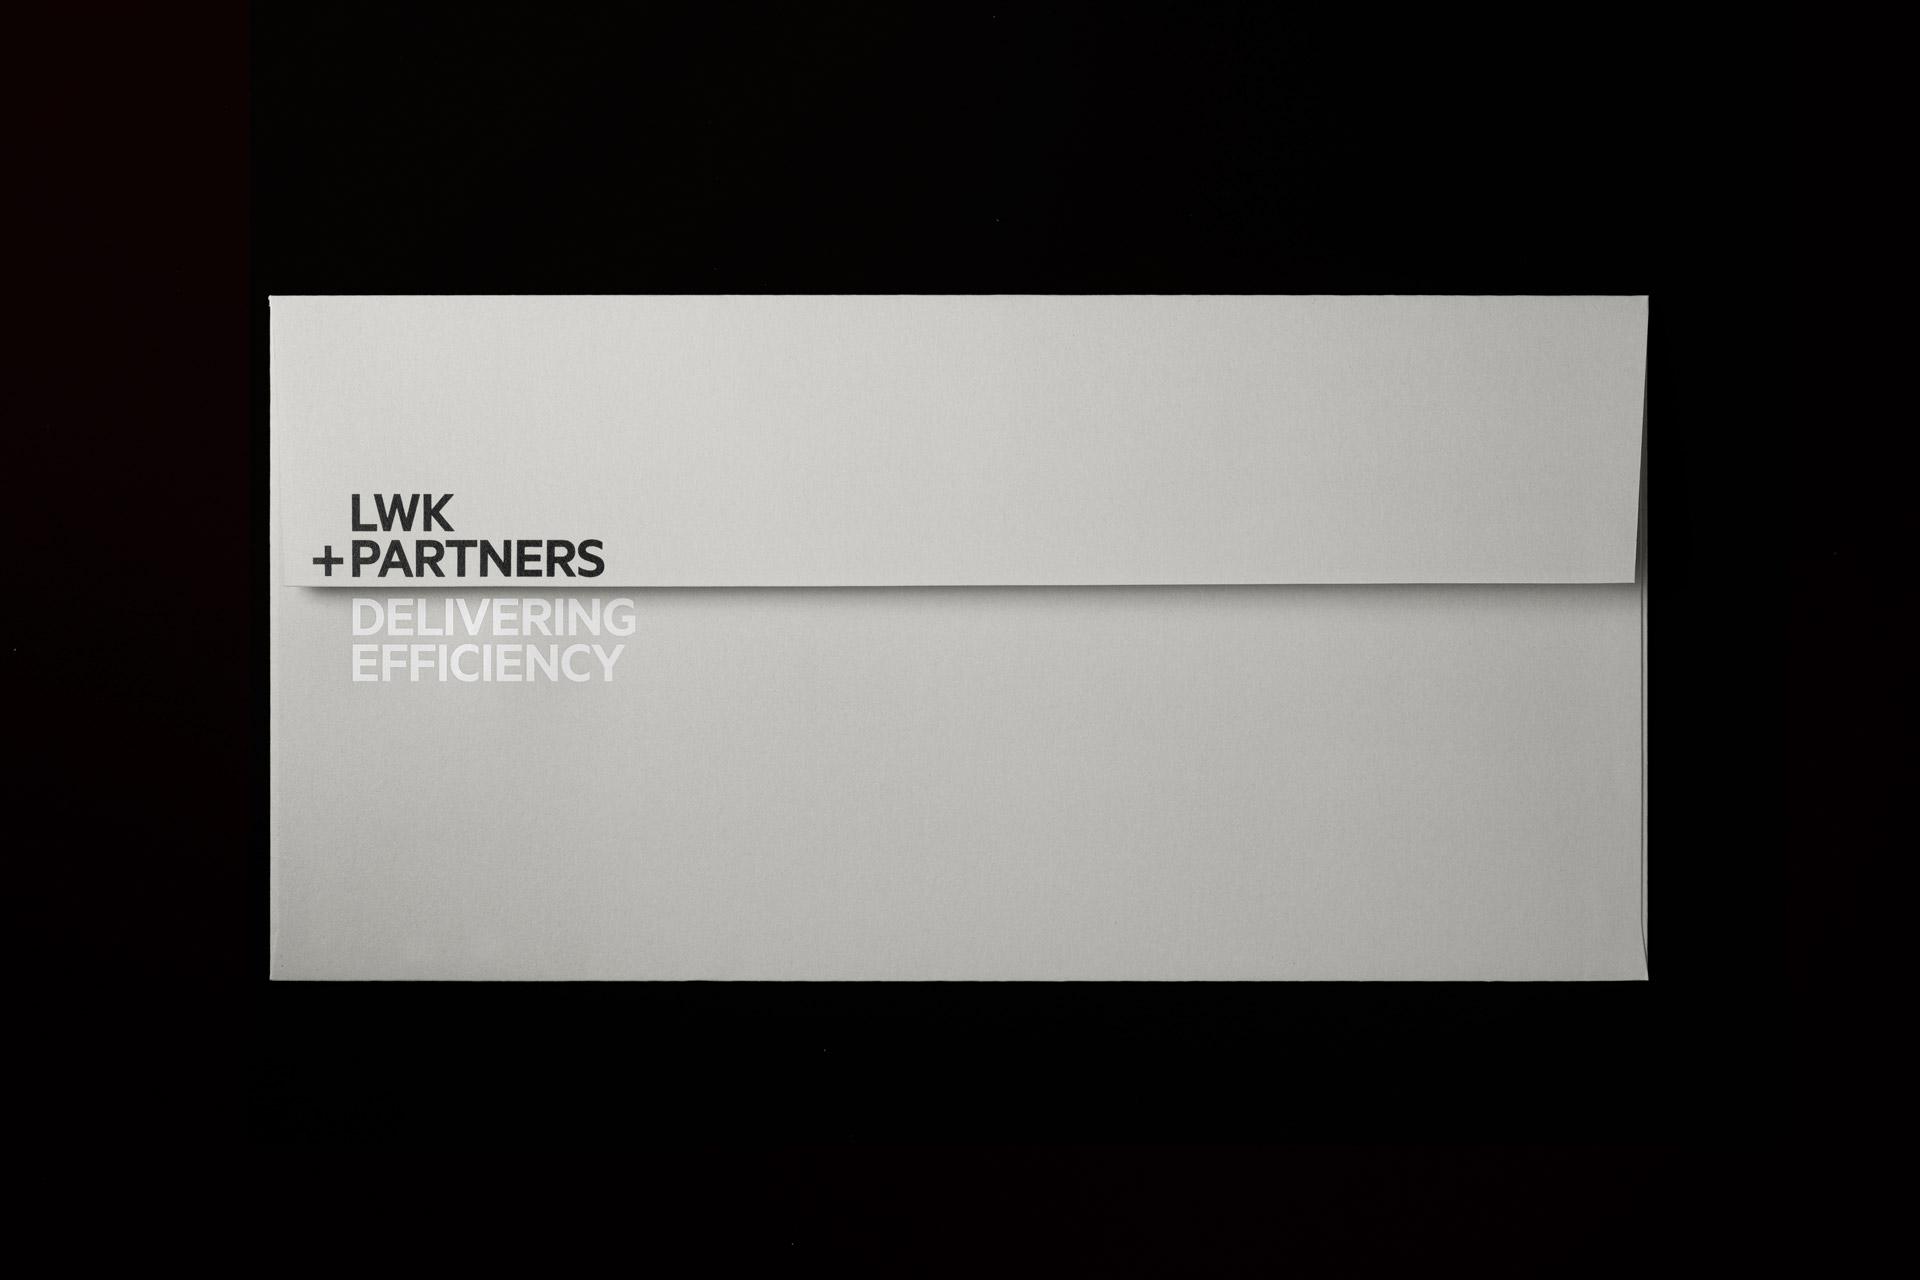 lwk-partners_06